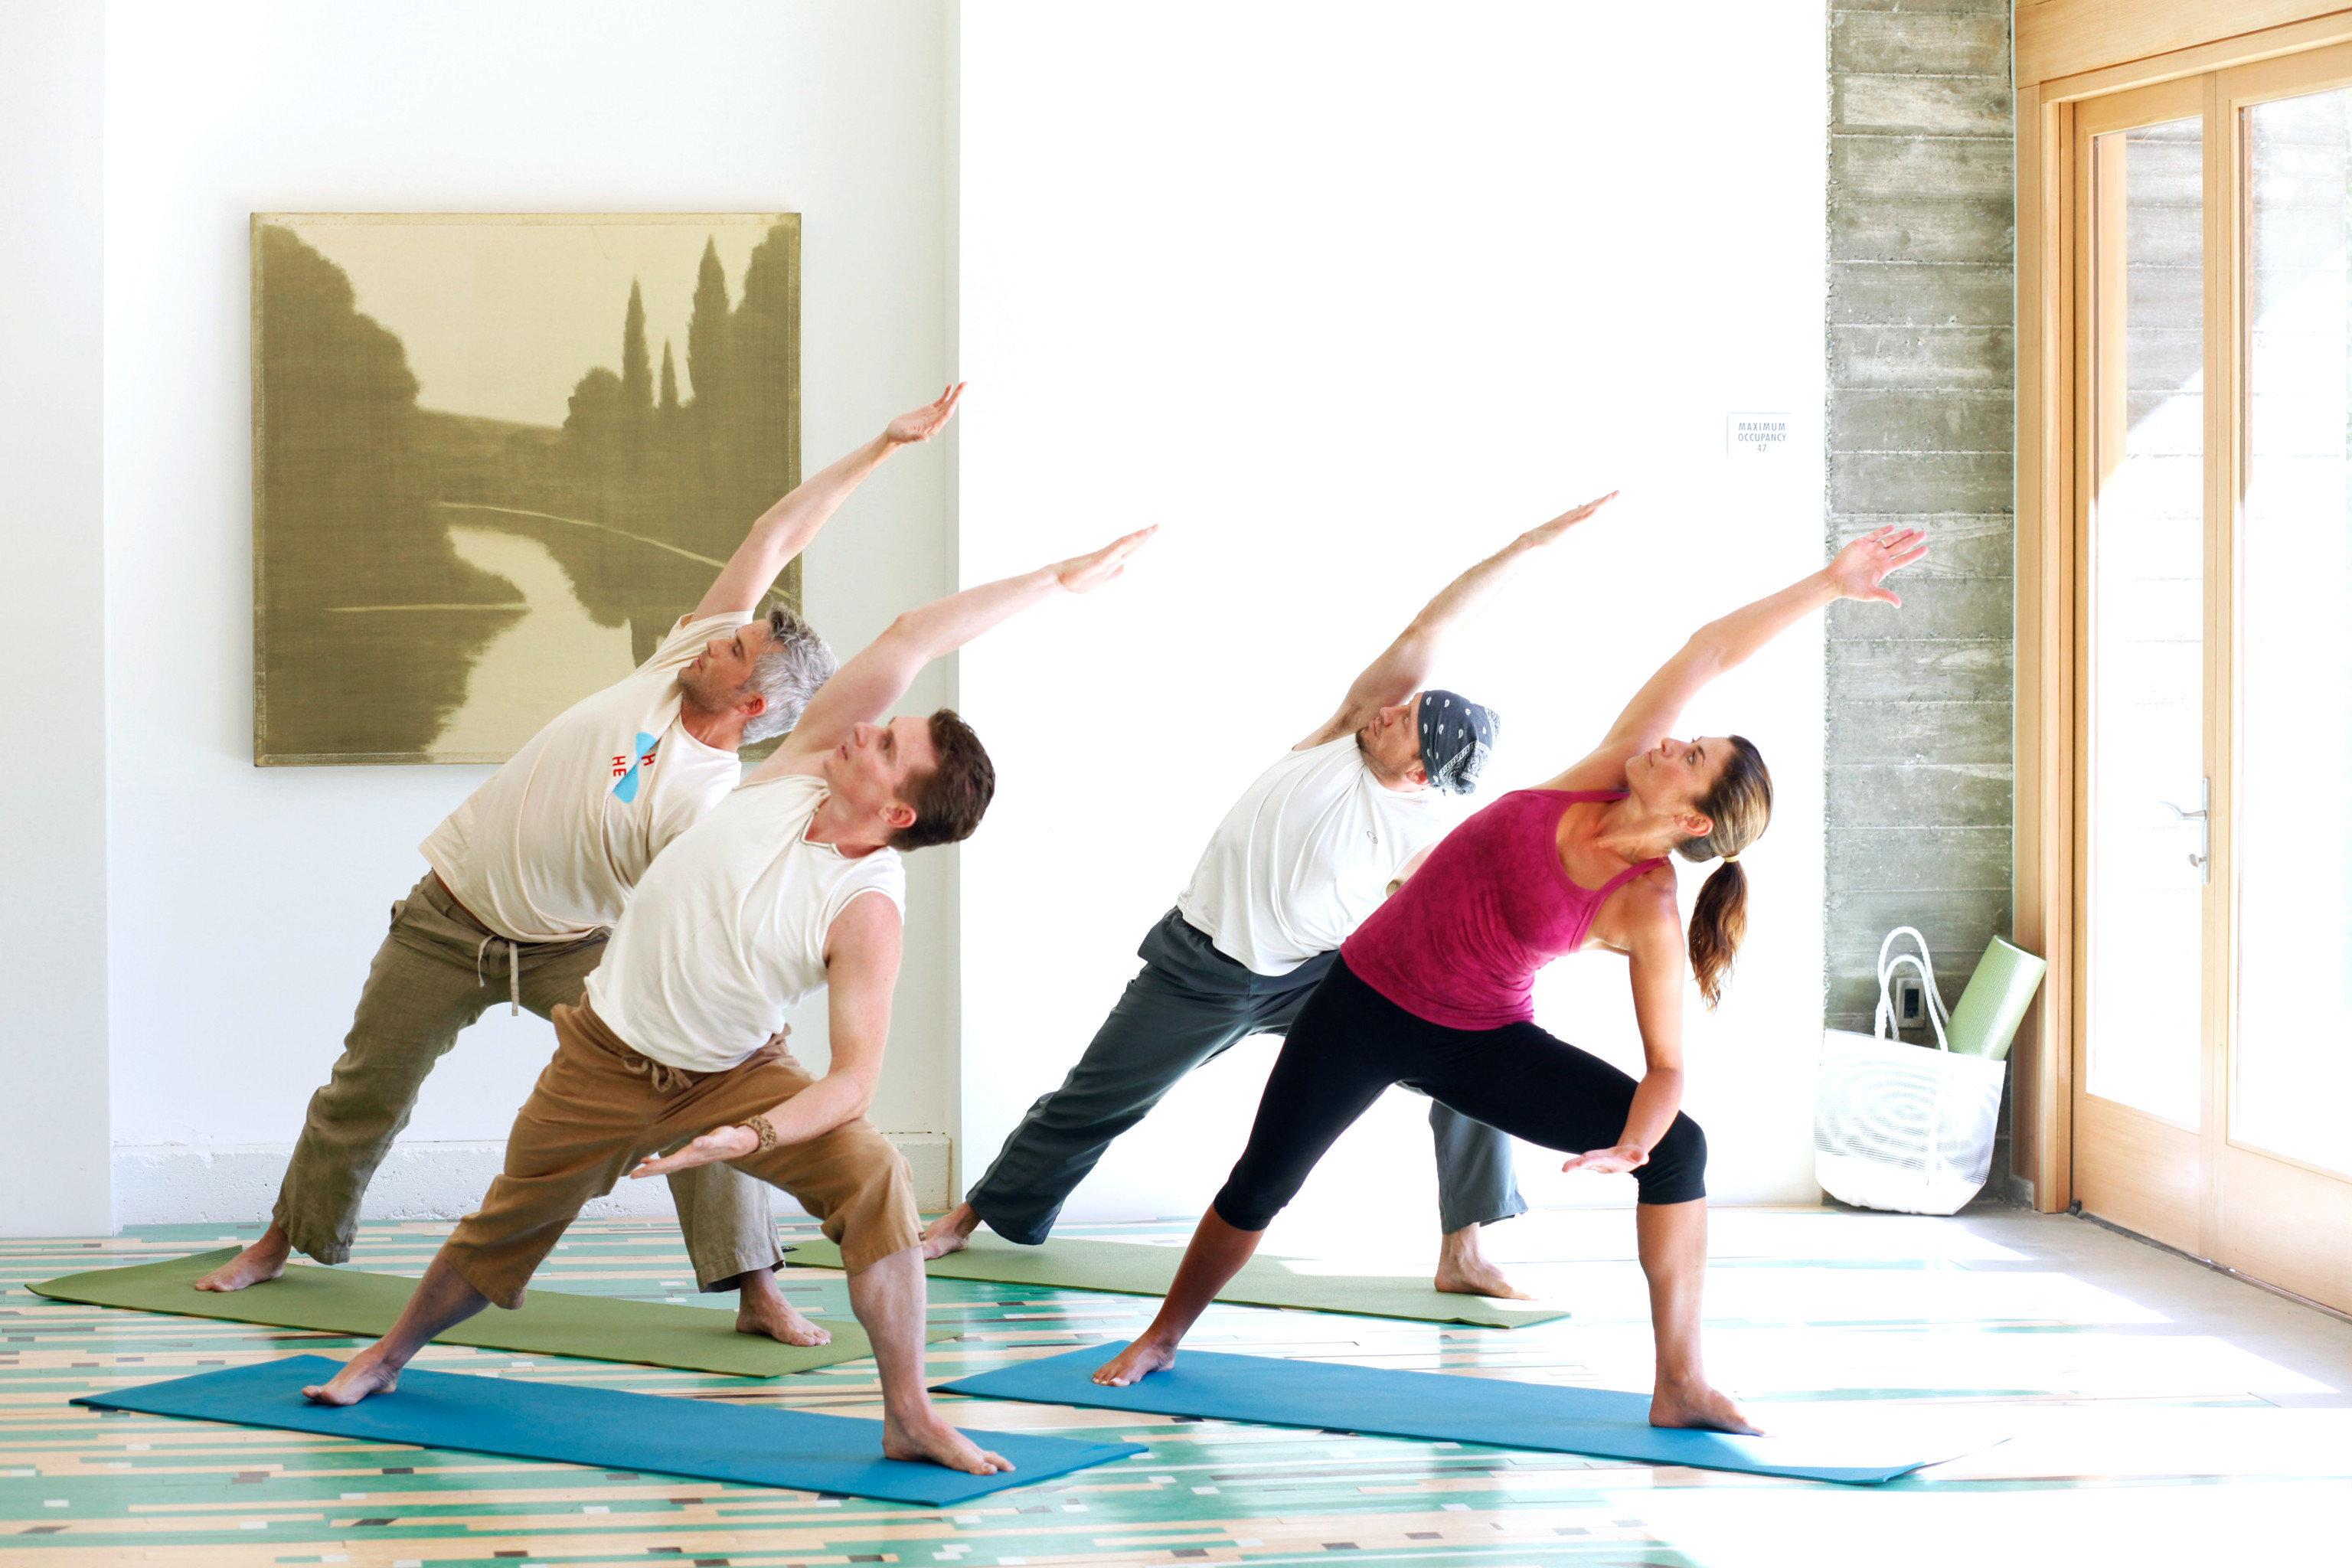 Fitness Health + Wellness Hotels Wellness Yoga Retreats sports physical fitness Sport martial arts yoga modern dance contact sport combat sport concert dance striking combat sports